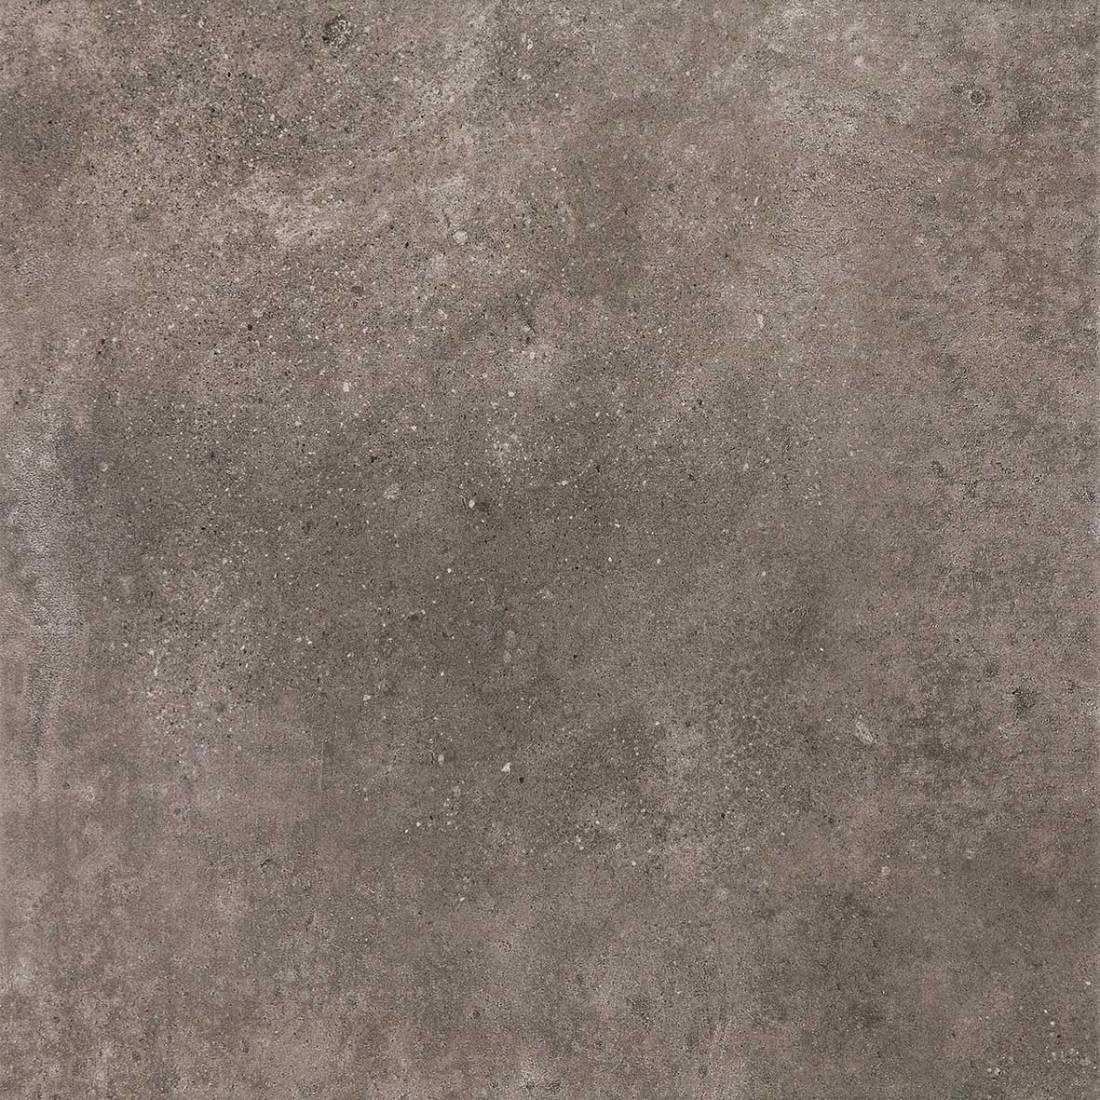 Madrid 42.5x42.5 Dark Grey 1